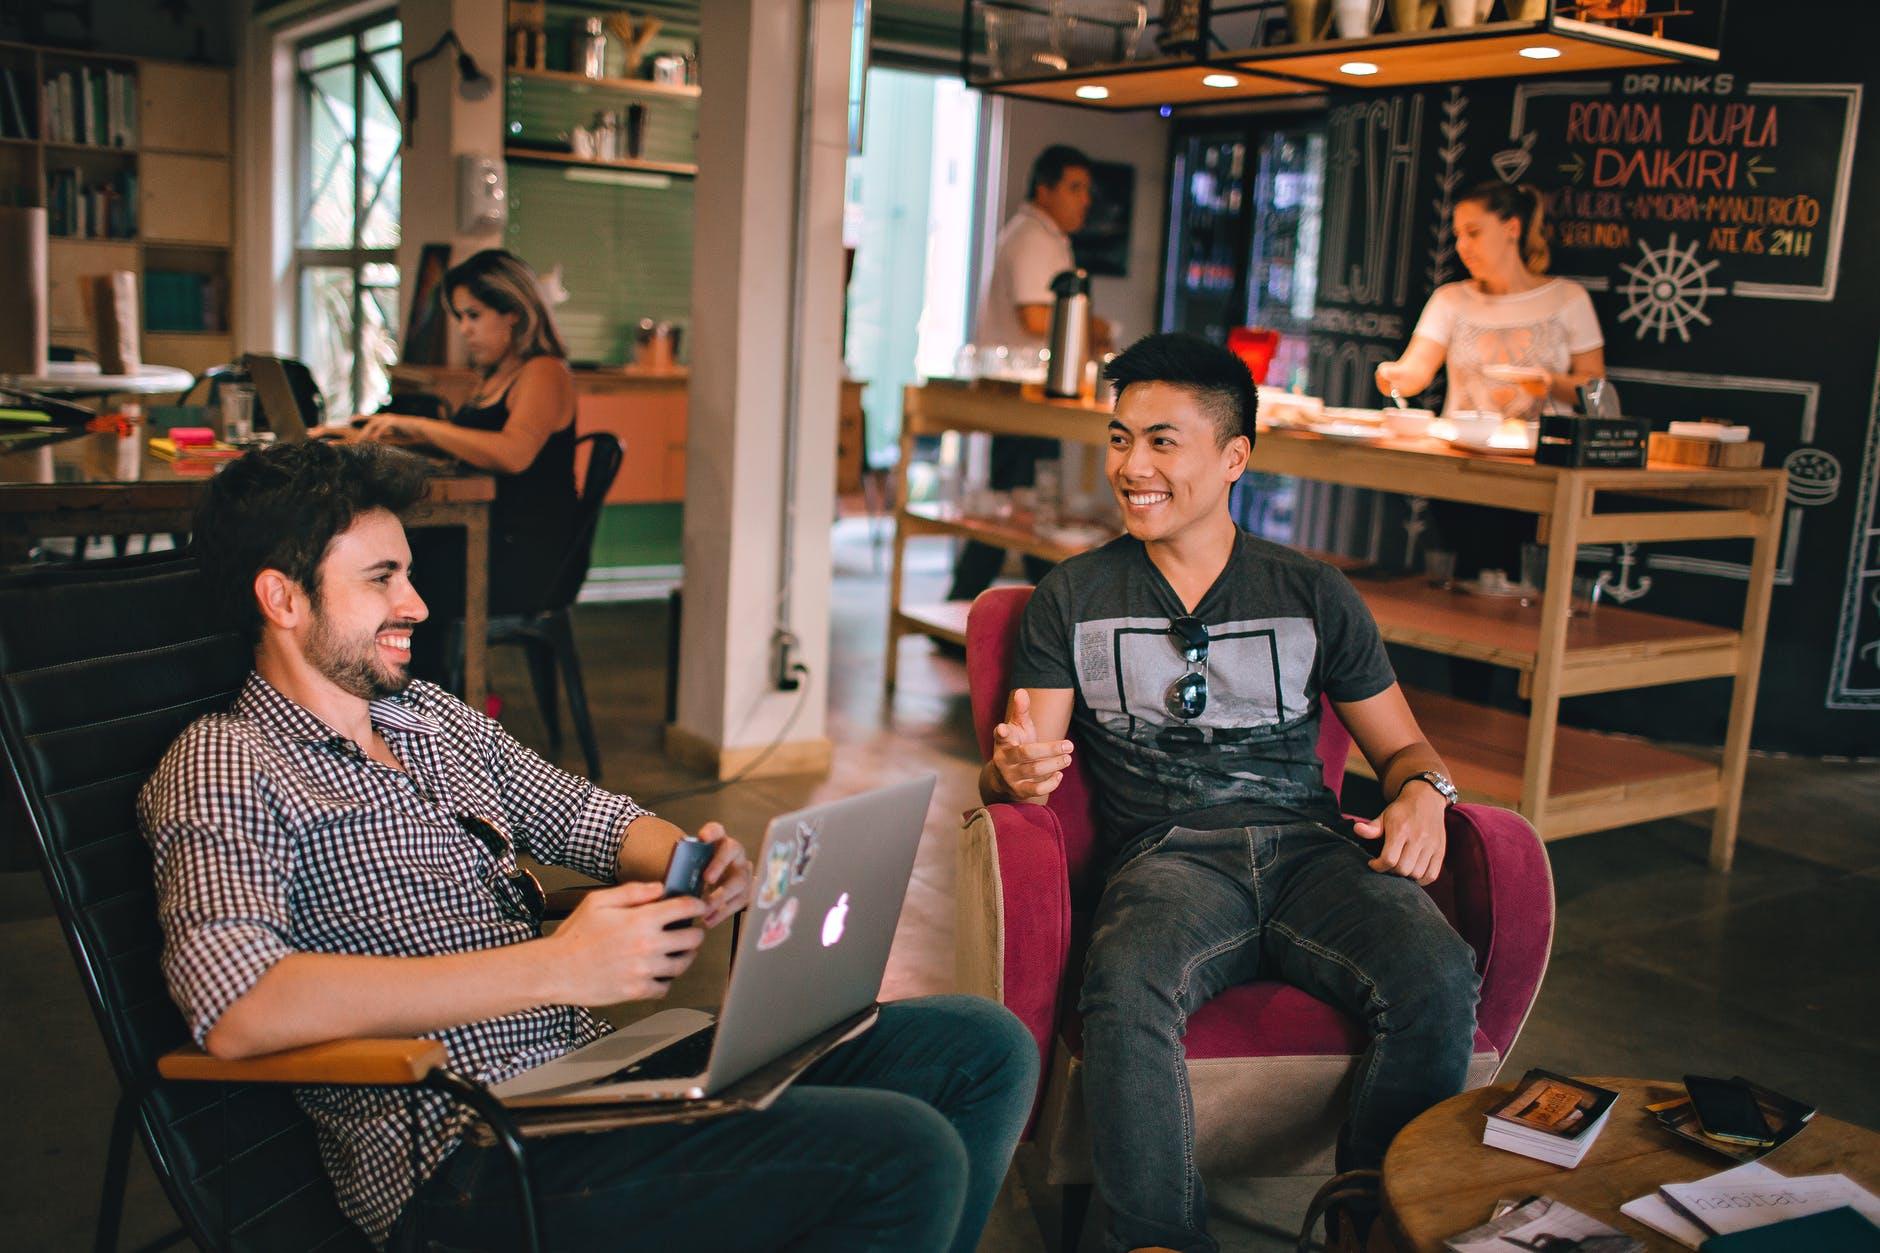 casio blog image Jordan